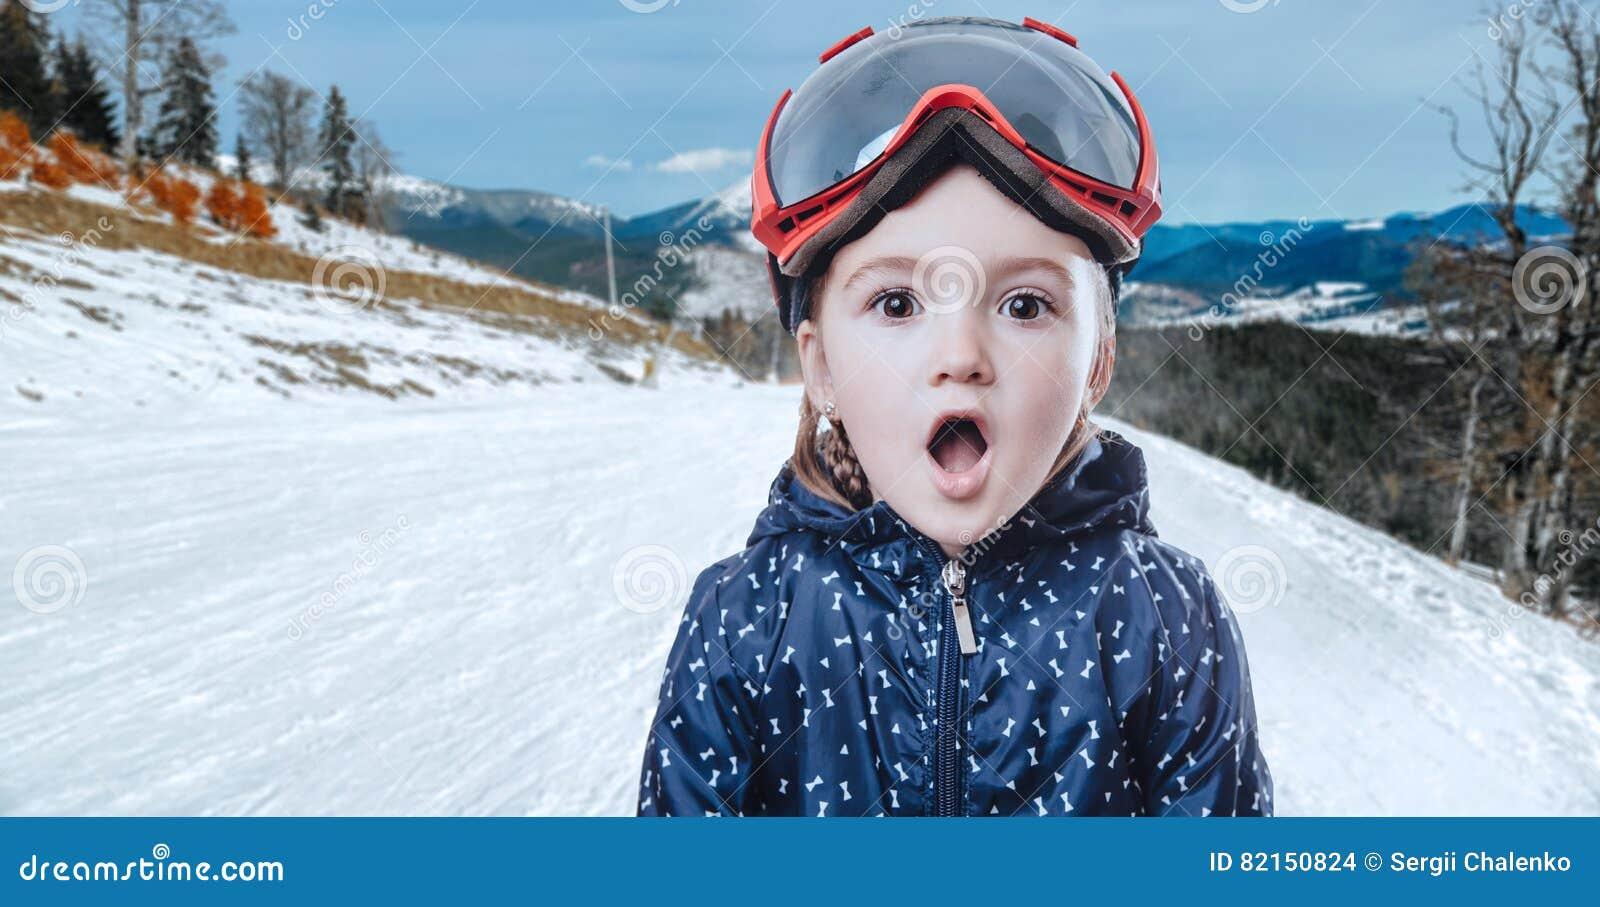 Jong geitjemeisje in skitoestel op de winterachtergrond